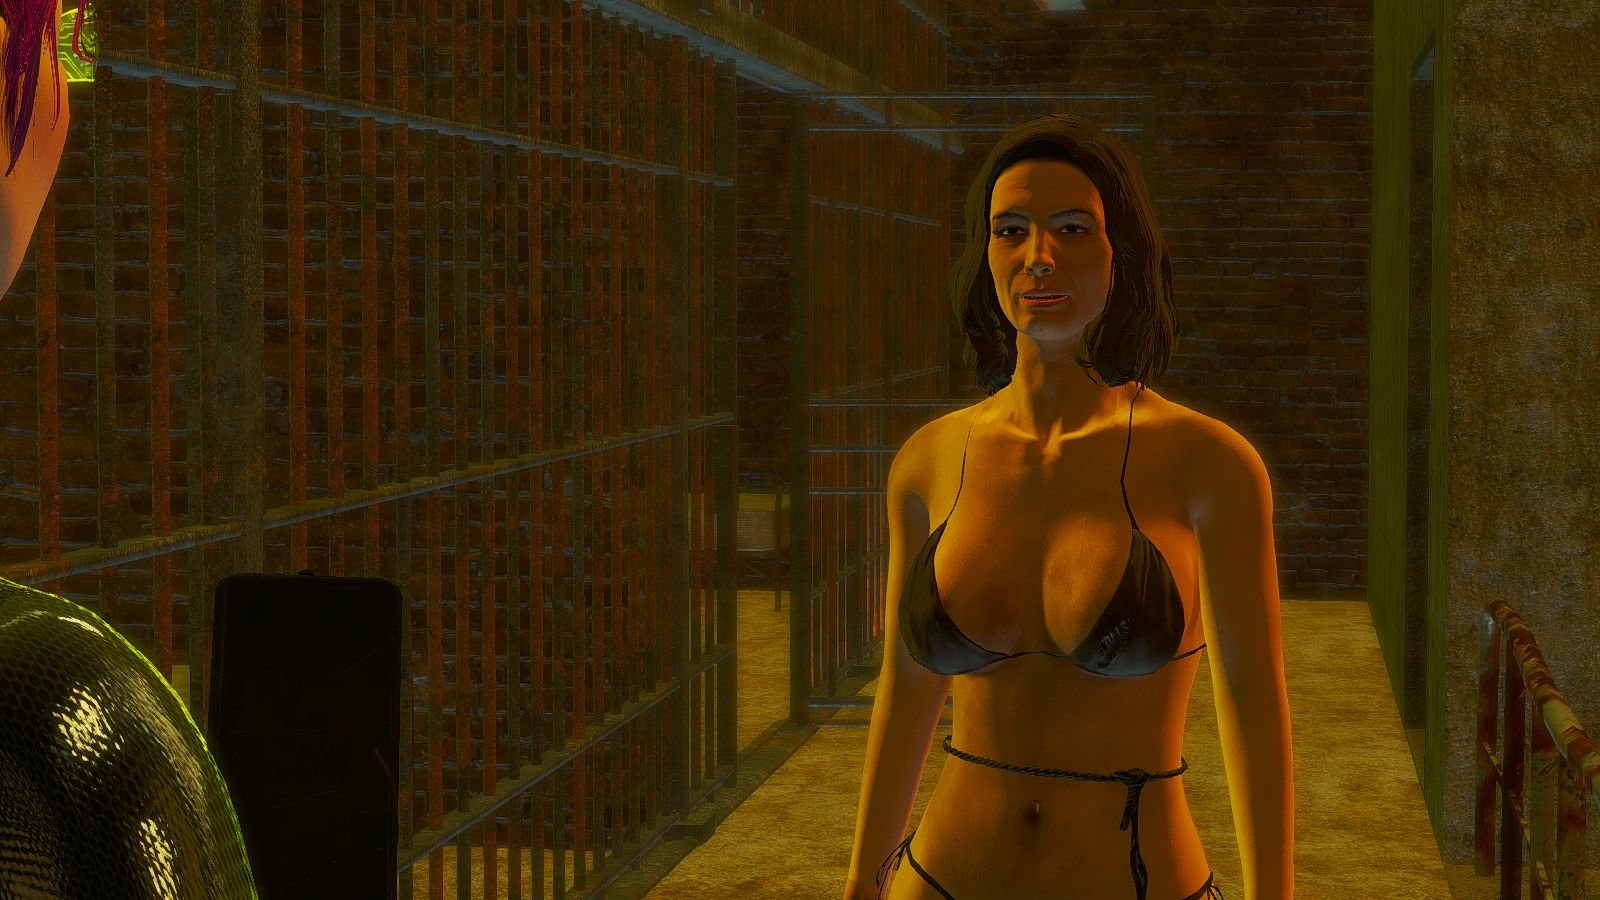 Спасаем пленницу из тюрьмы.. Fallout-4 (Сборка 6.4)